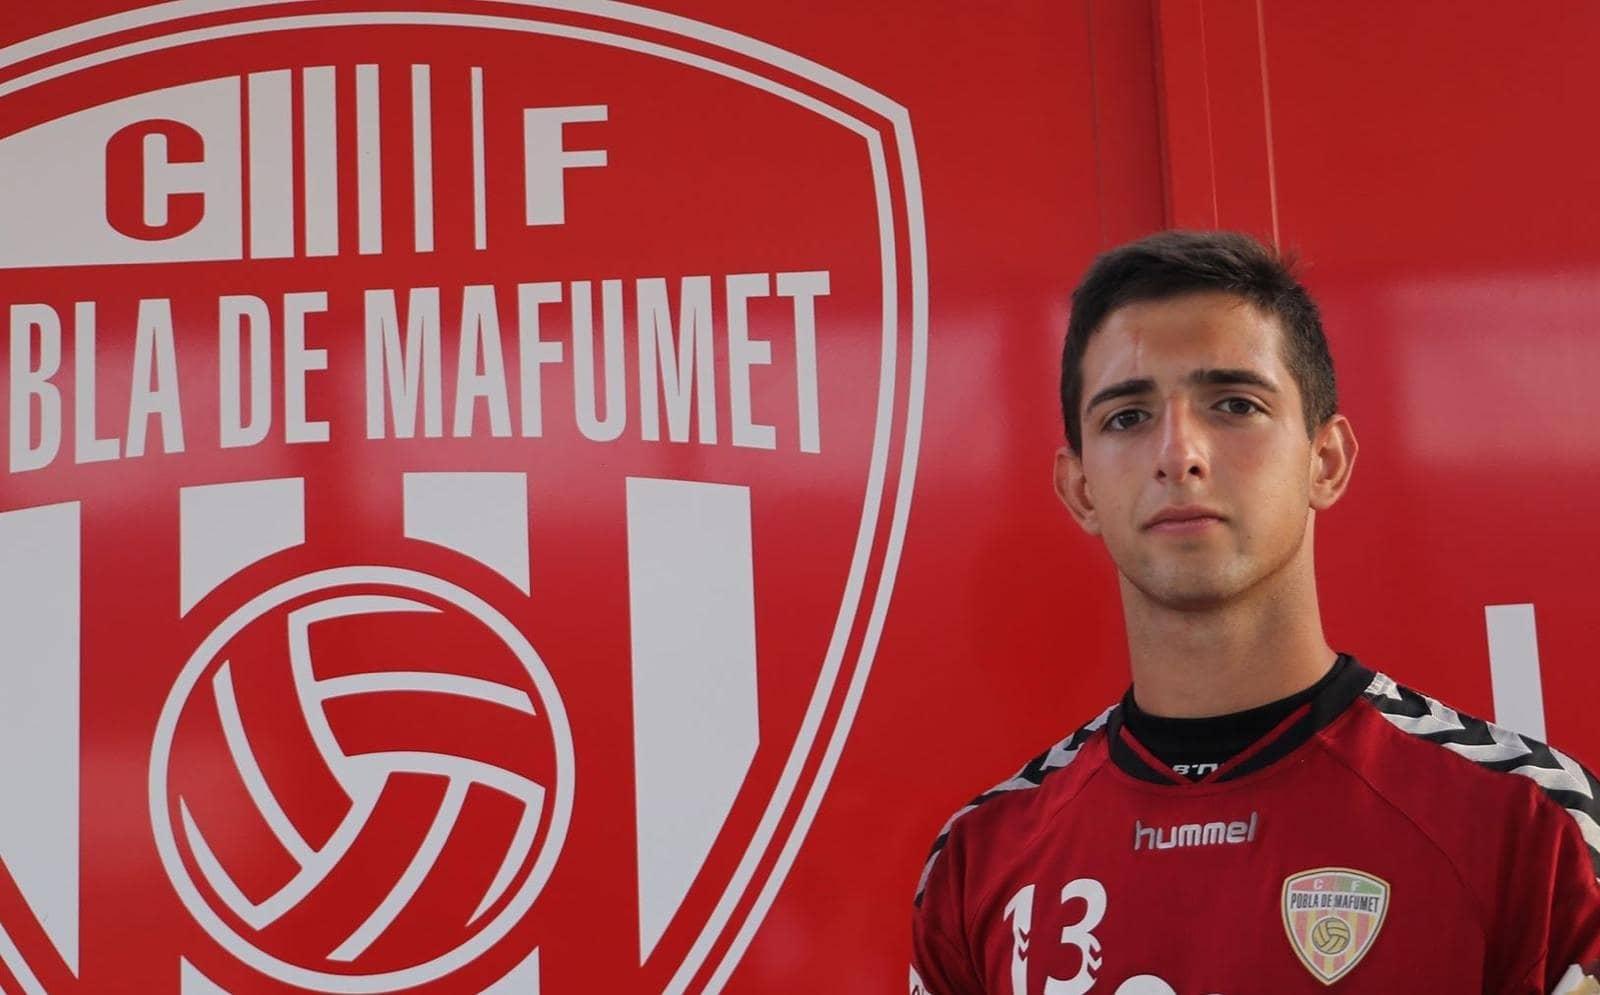 El porter Dani Parra, nou jugador del CF Pobla de Mafumet